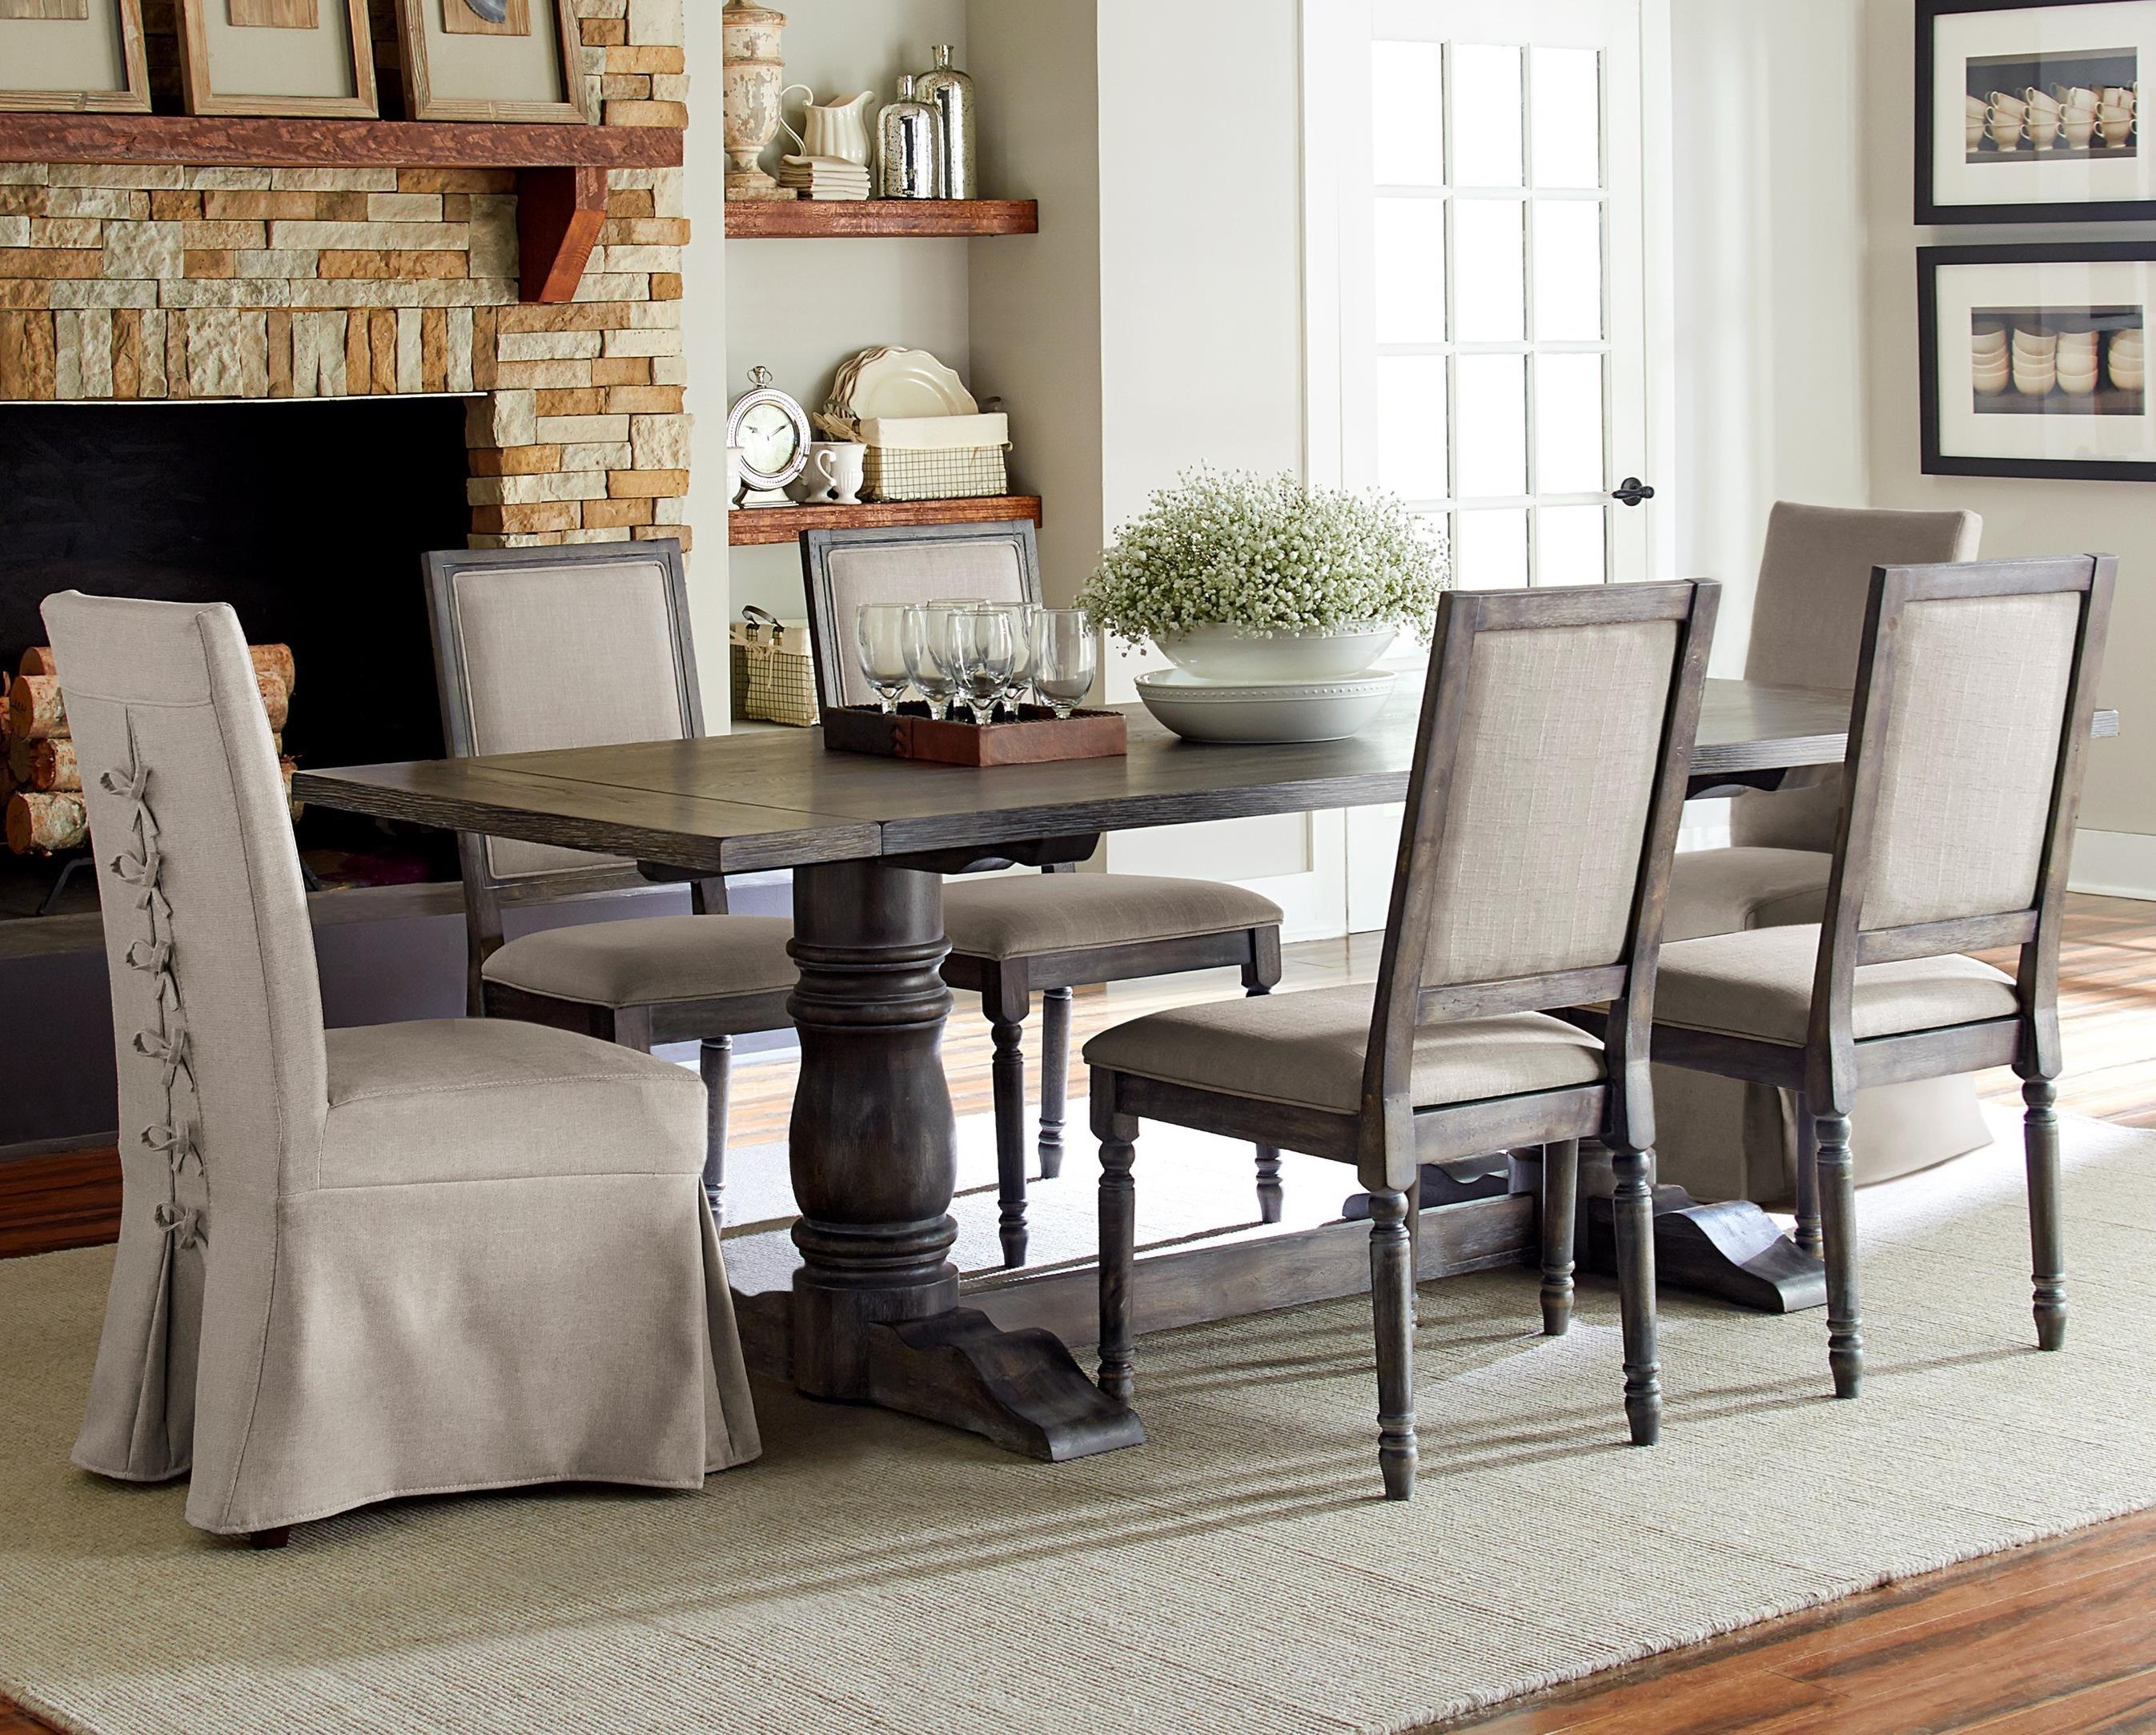 Progressive Furniture Muses 7-Piece Rectangular Dining Table Set - Item Number: P836-10B+10T+2x60+4x65